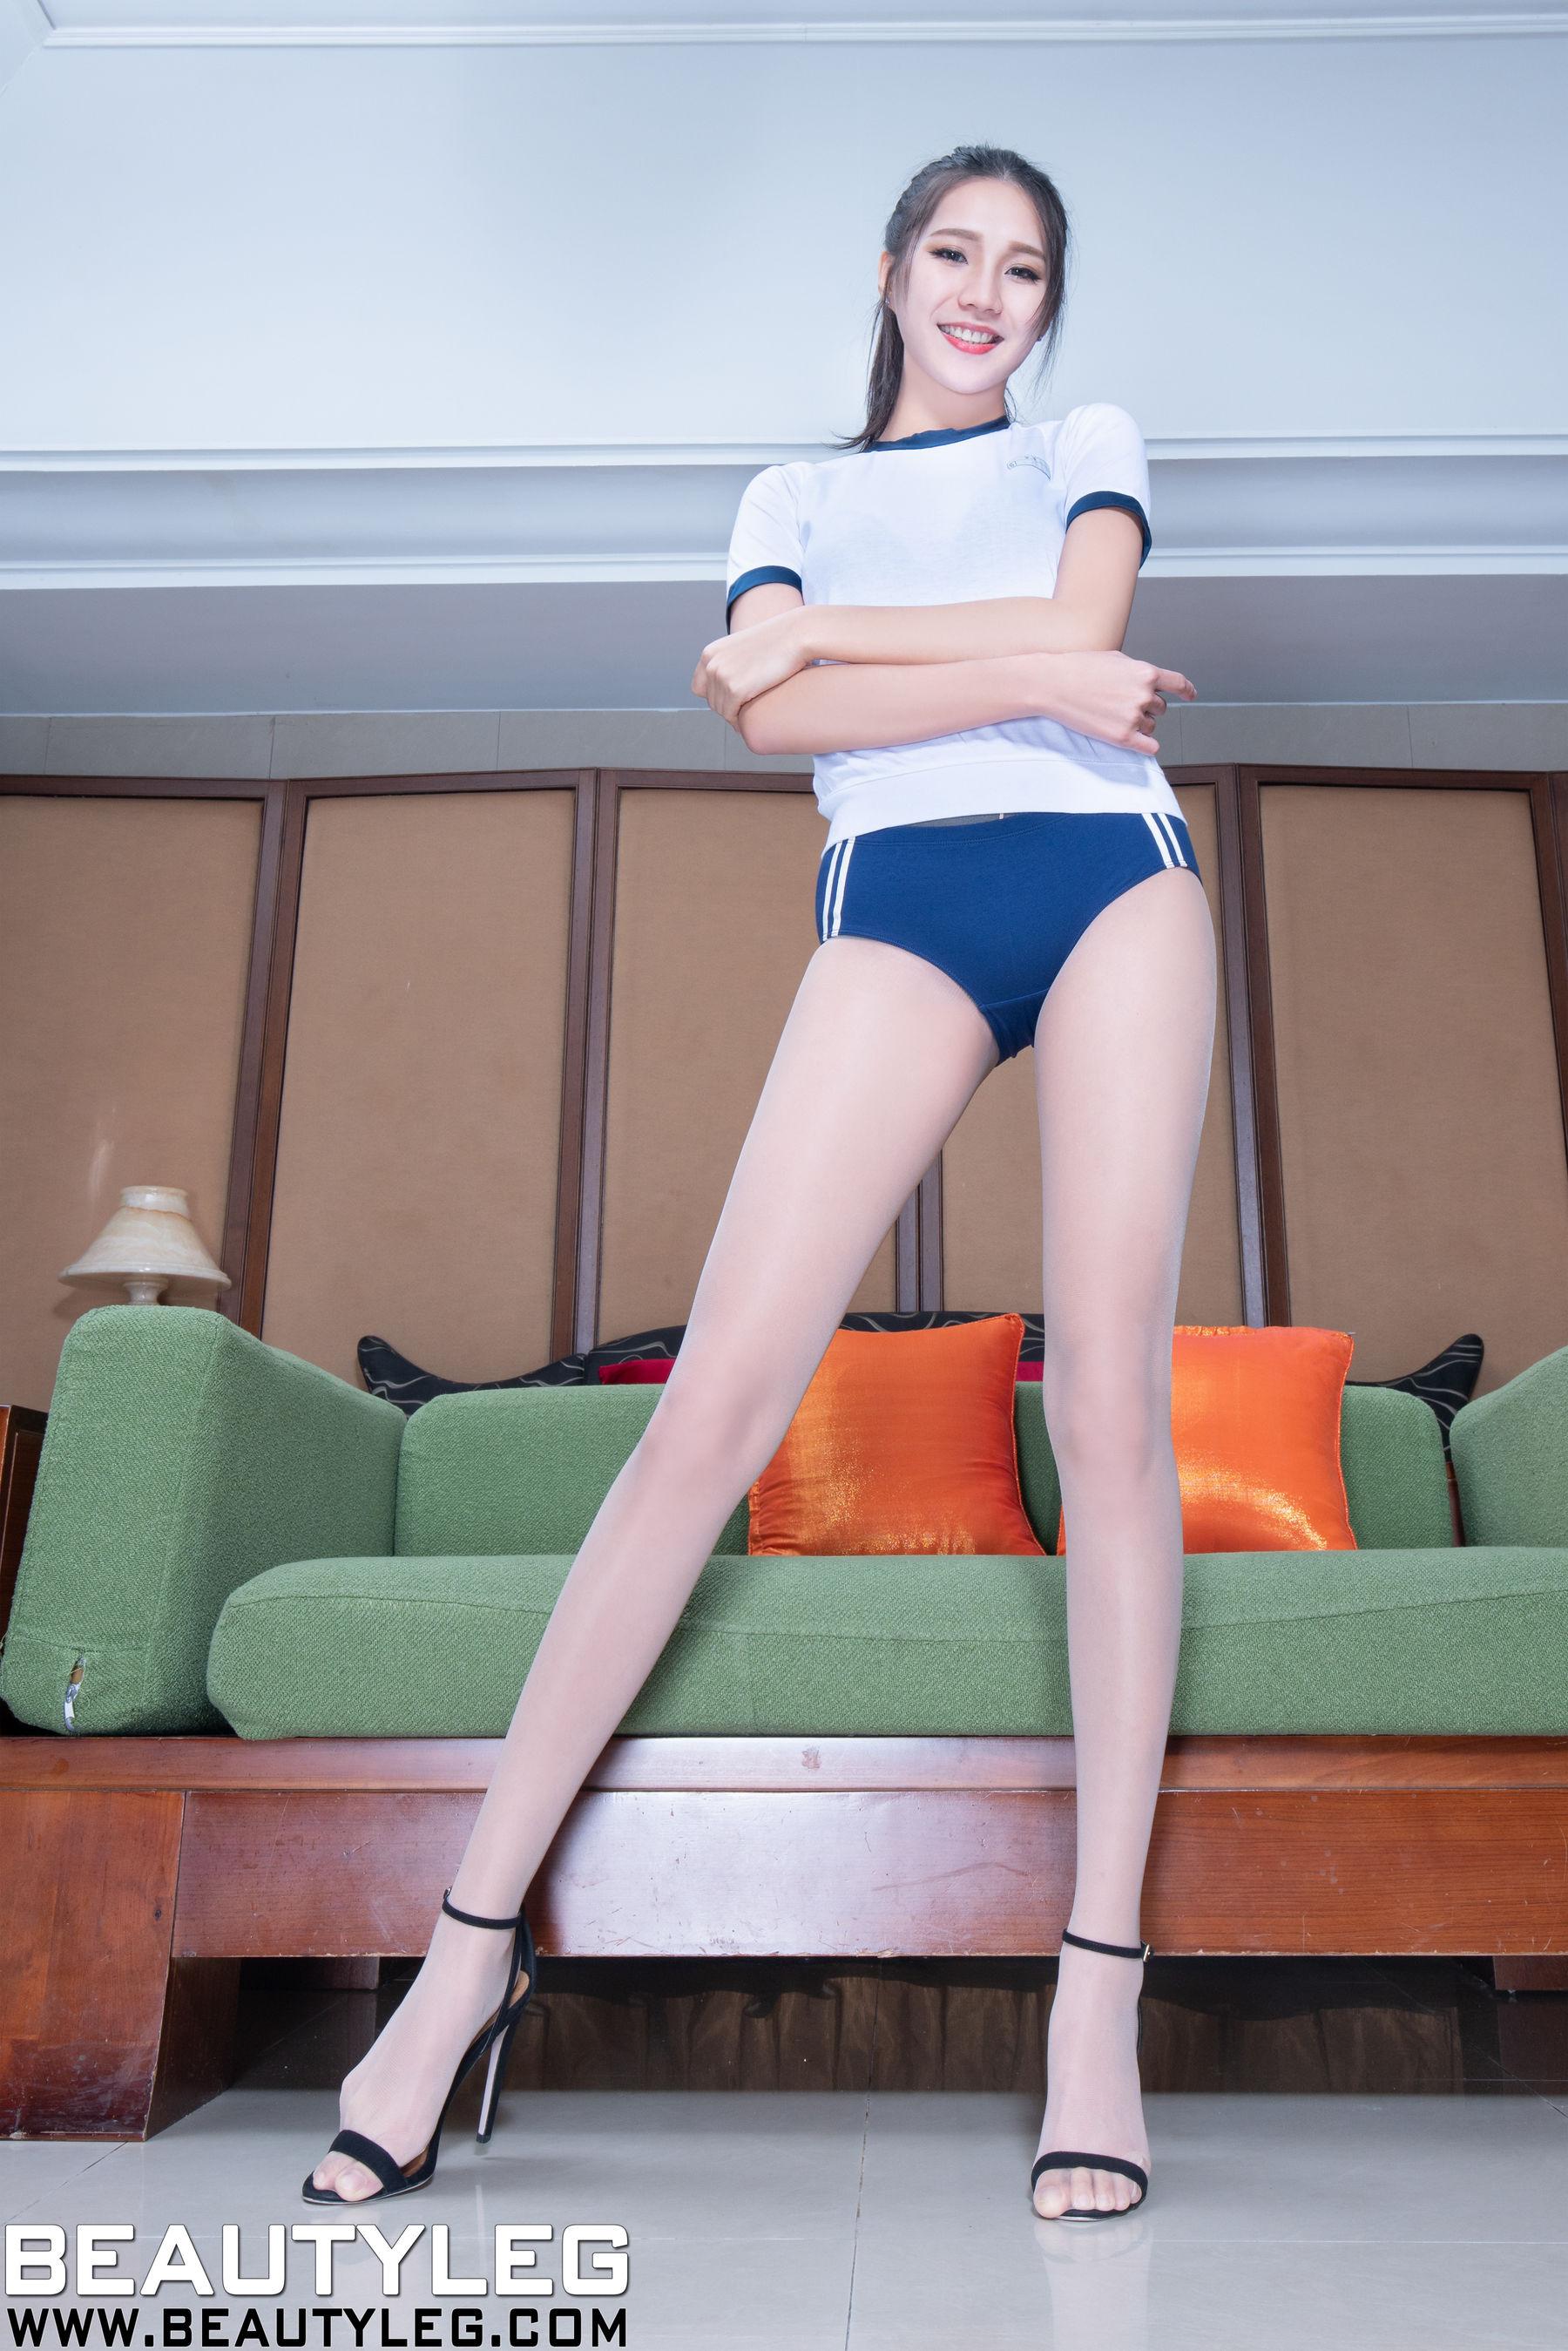 VOL.438 [Beautyleg]美腿高跟长腿美女:林千如(腿模Anita)超高清个人性感漂亮大图(58P)